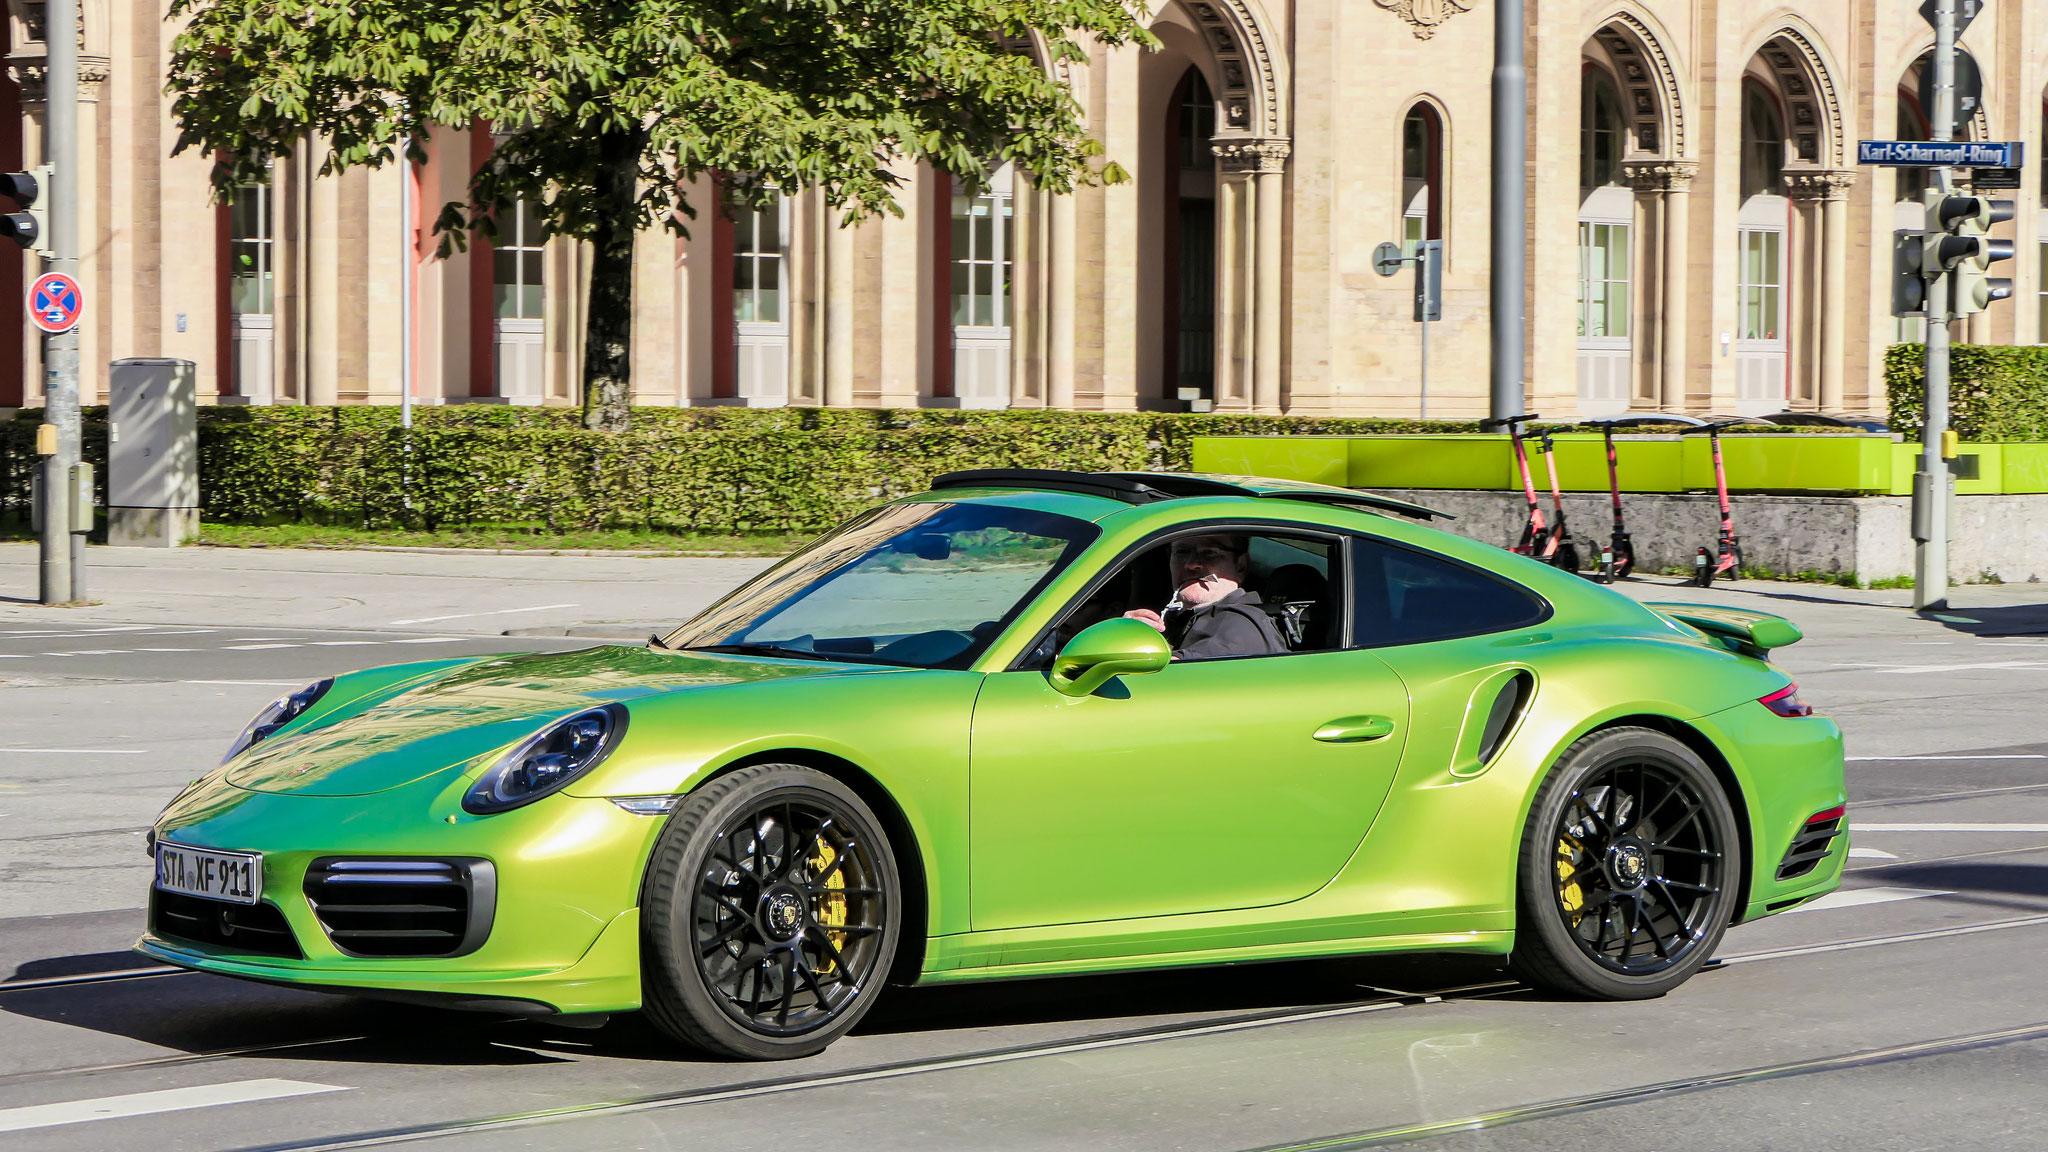 Porsche 911 Turbo S - STA-XF-911